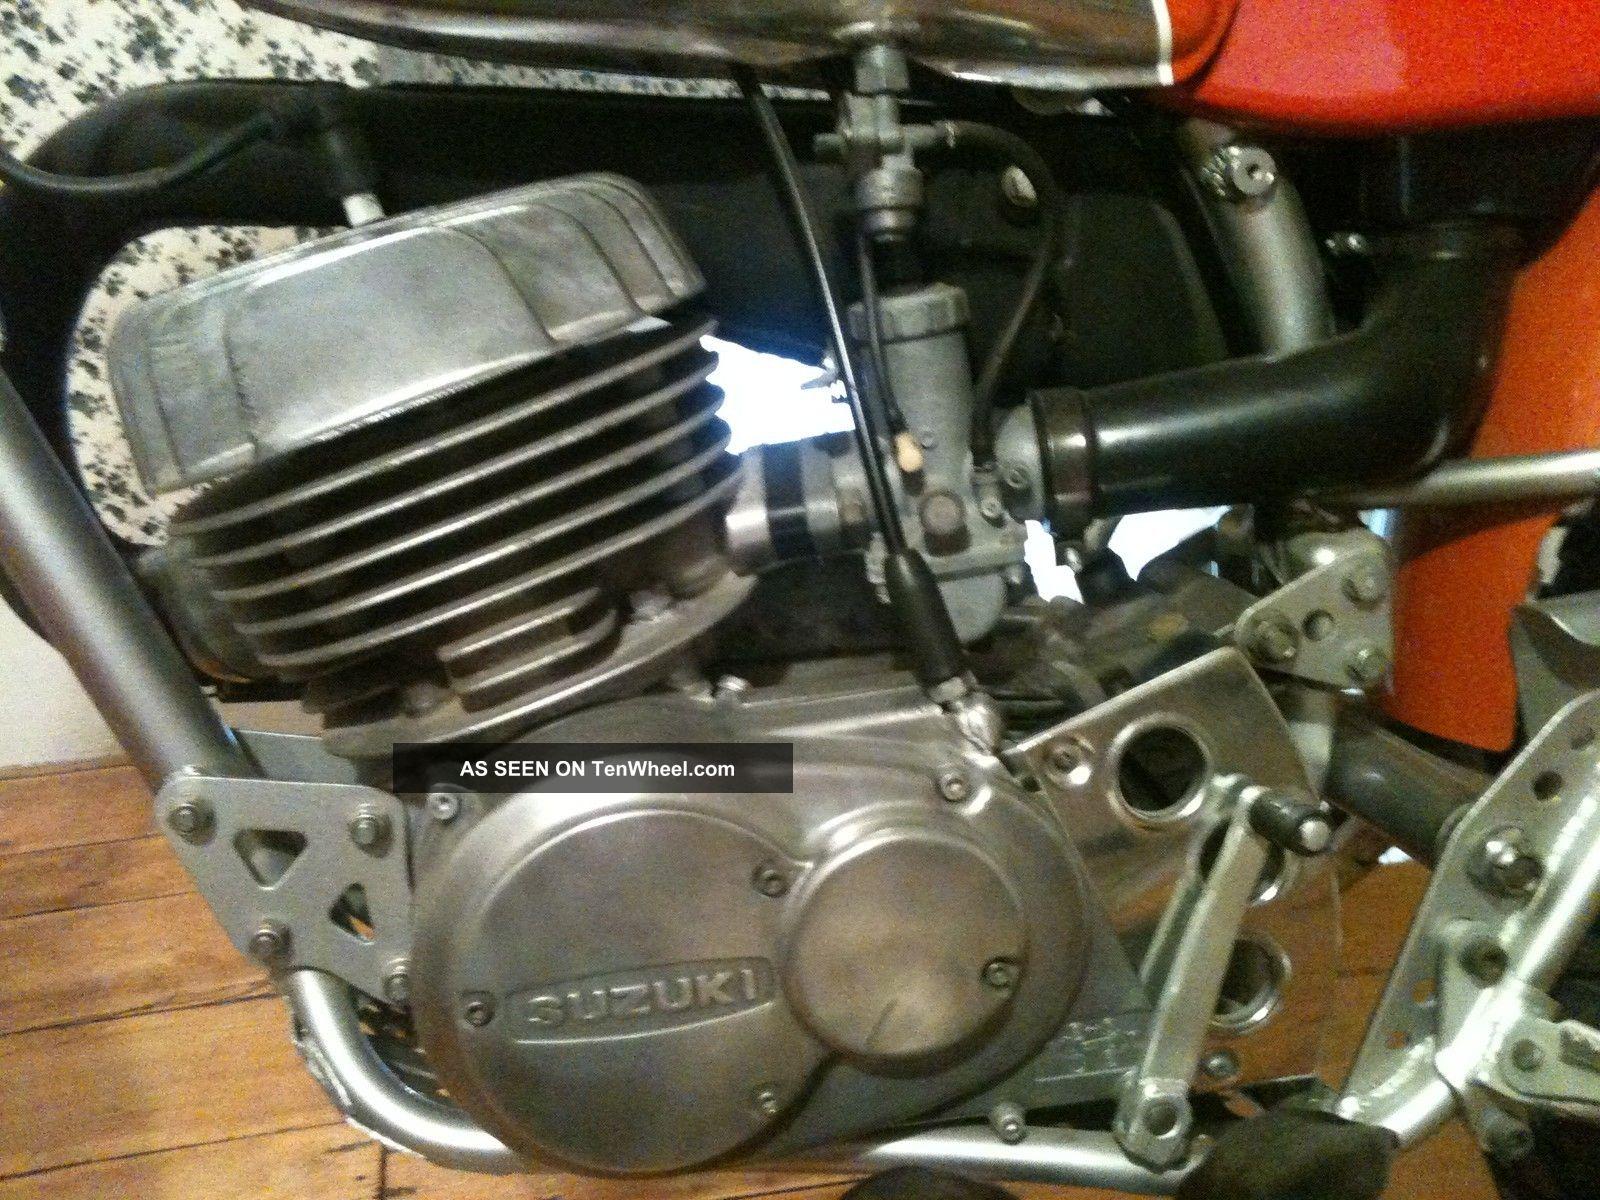 2012 Daytona 675 Wiring Diagram All Kind Of Diagrams Crf250r Honda Cbr500r Elsalvadorla 2011 1280x1024